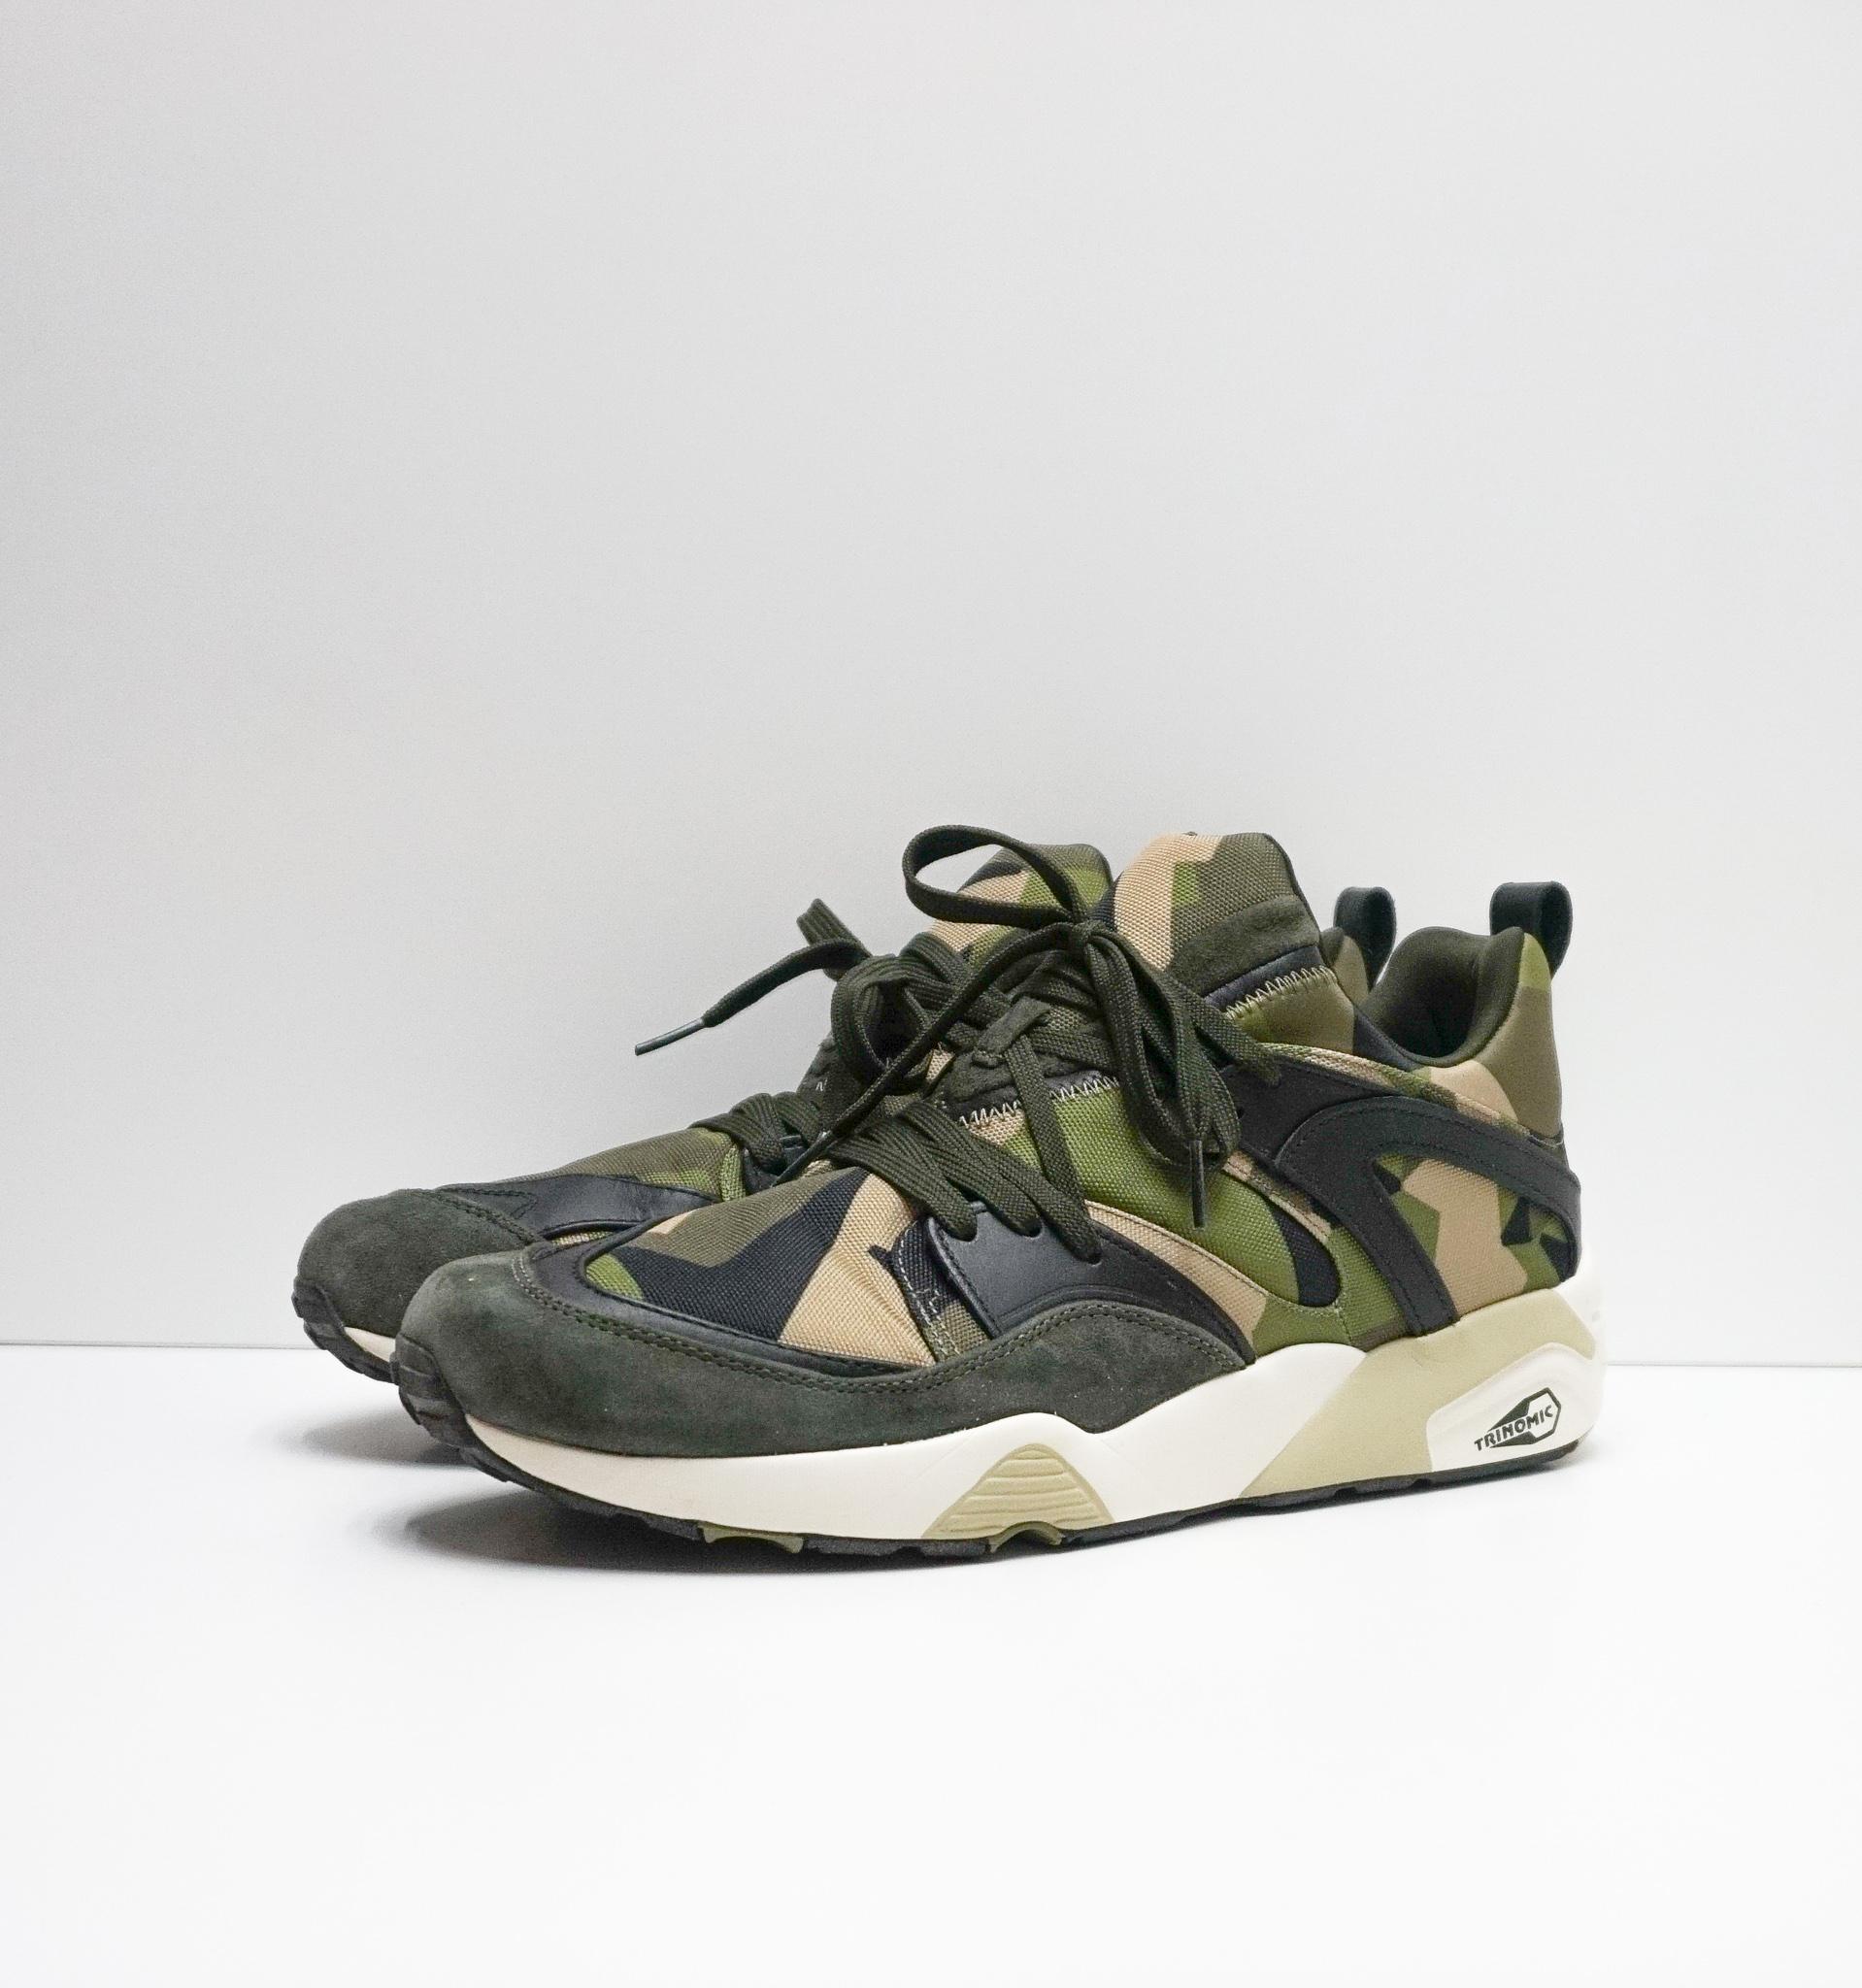 Sneakersnstuff X PUMA (Swedish Camo Pack)